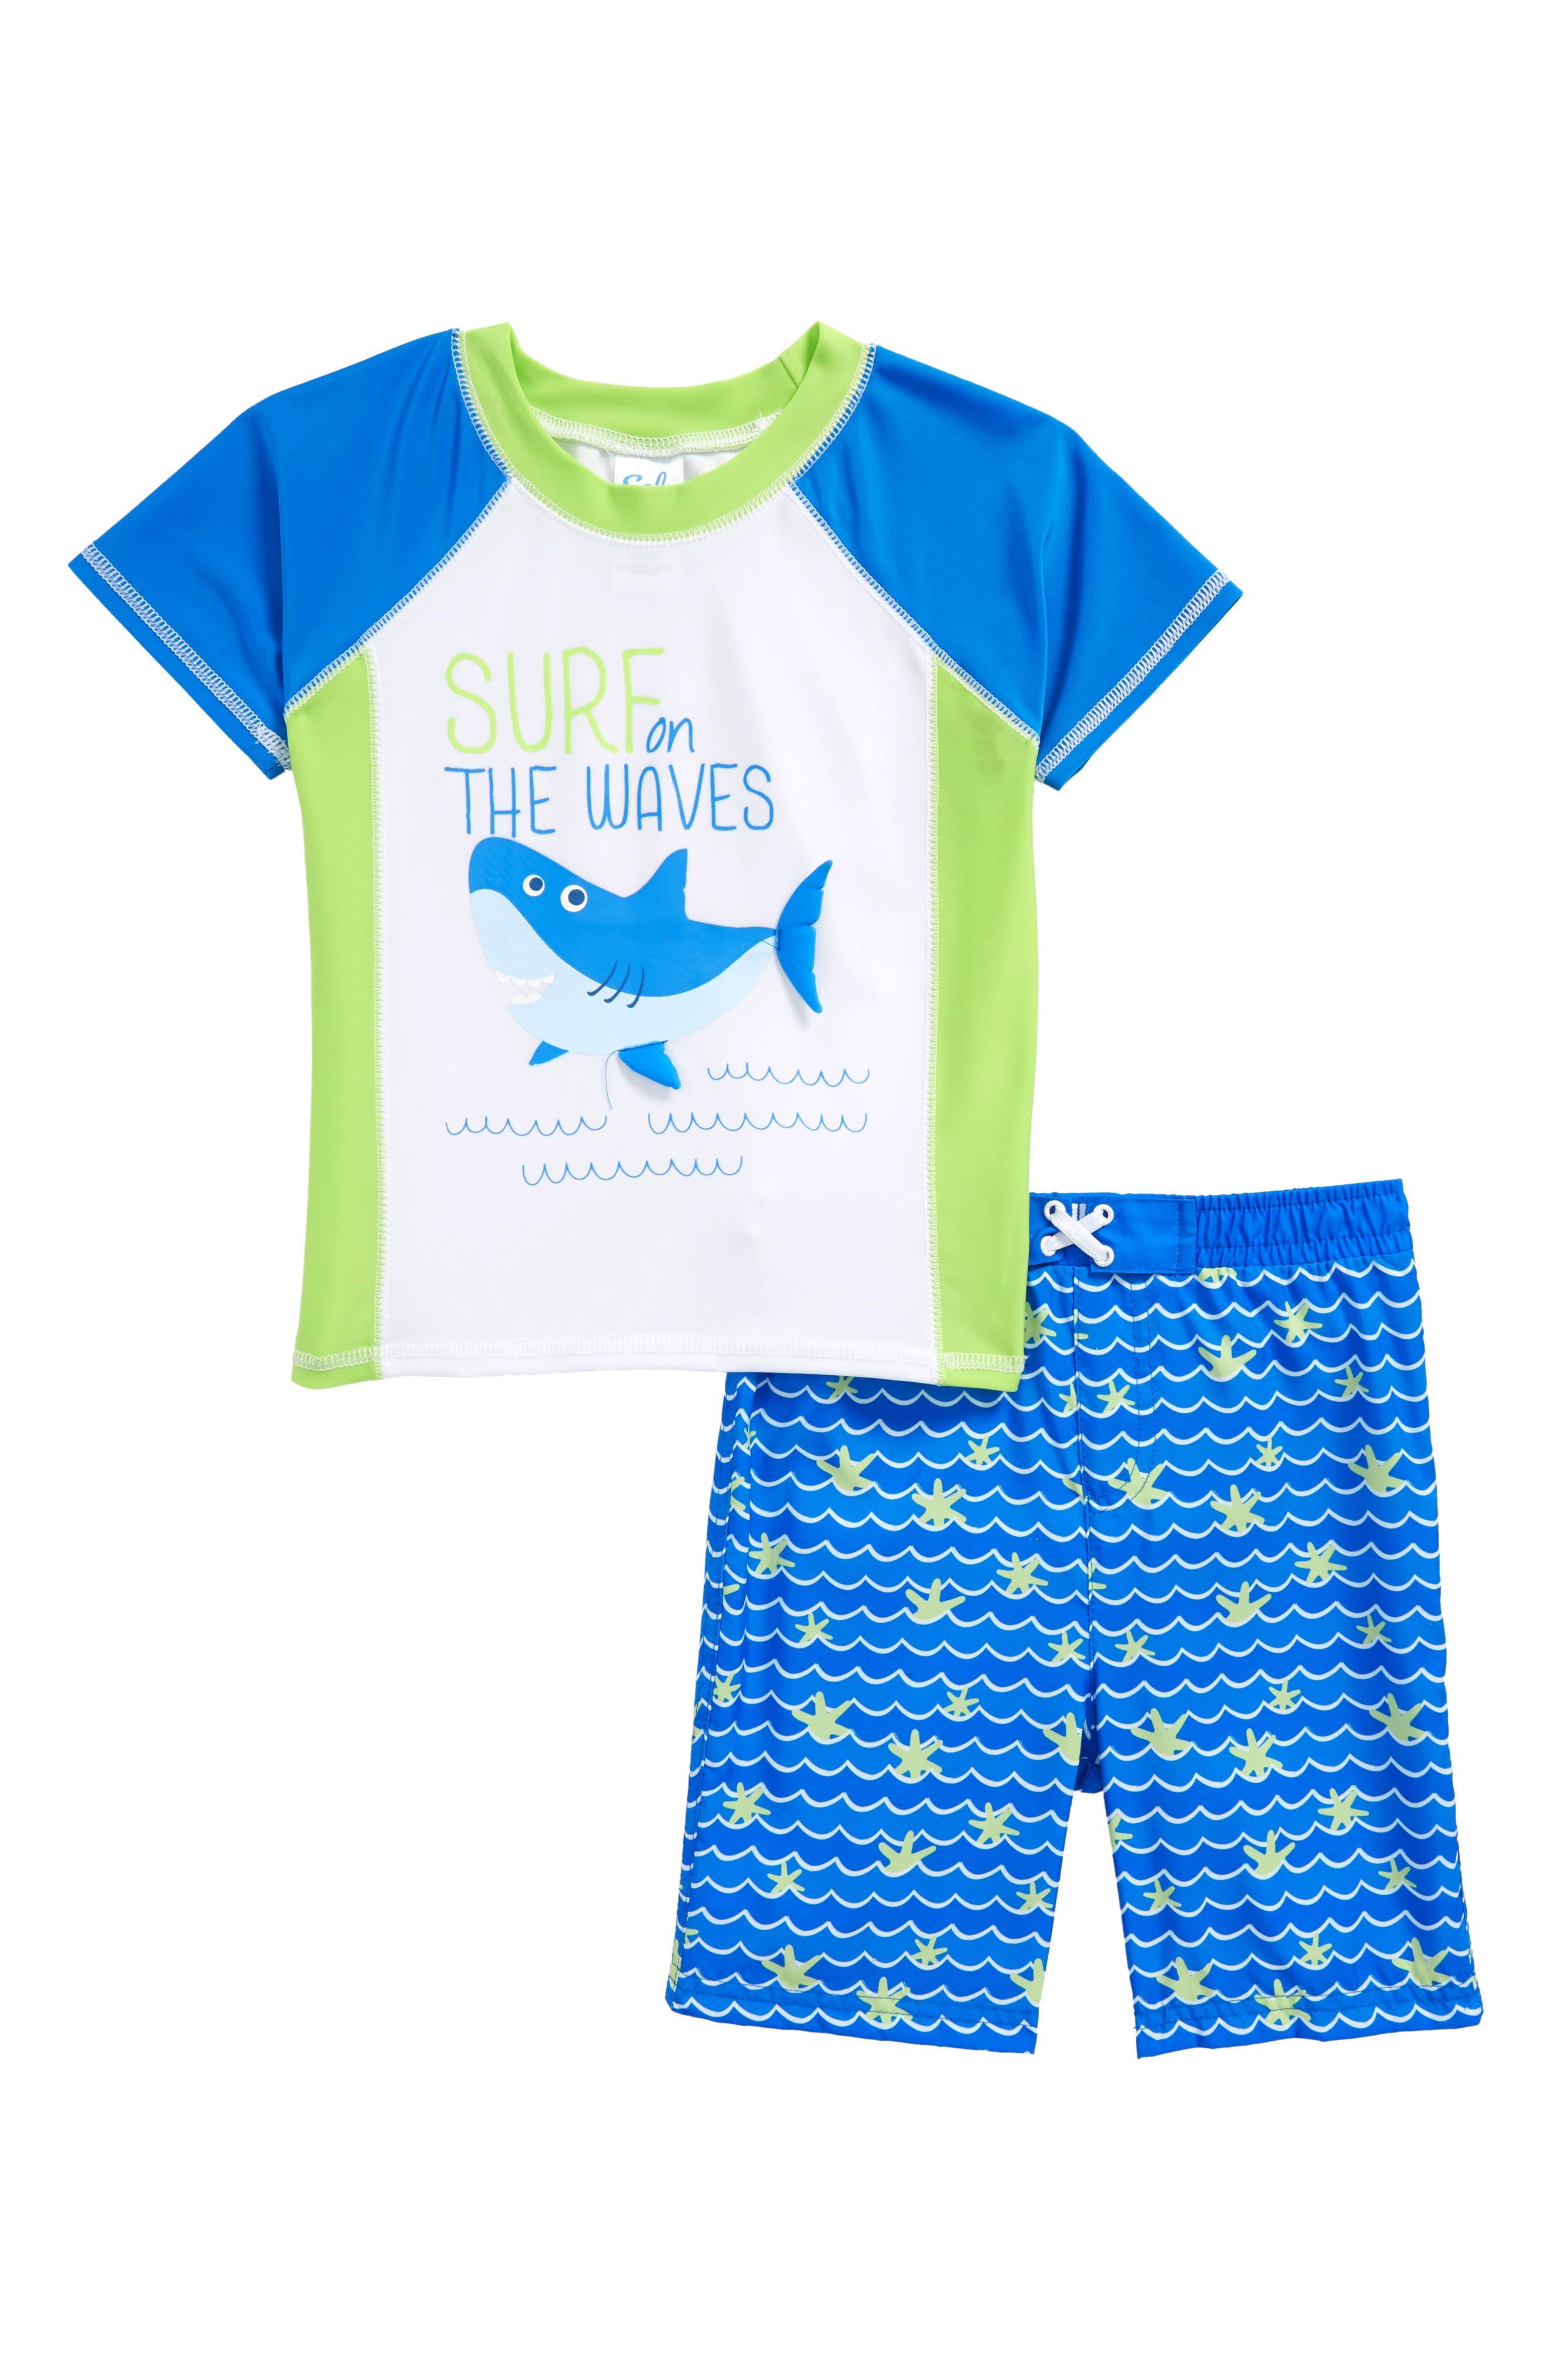 Shark Surf Two-Piece Rashguard Swimsuit,                         Main,                         color, 400